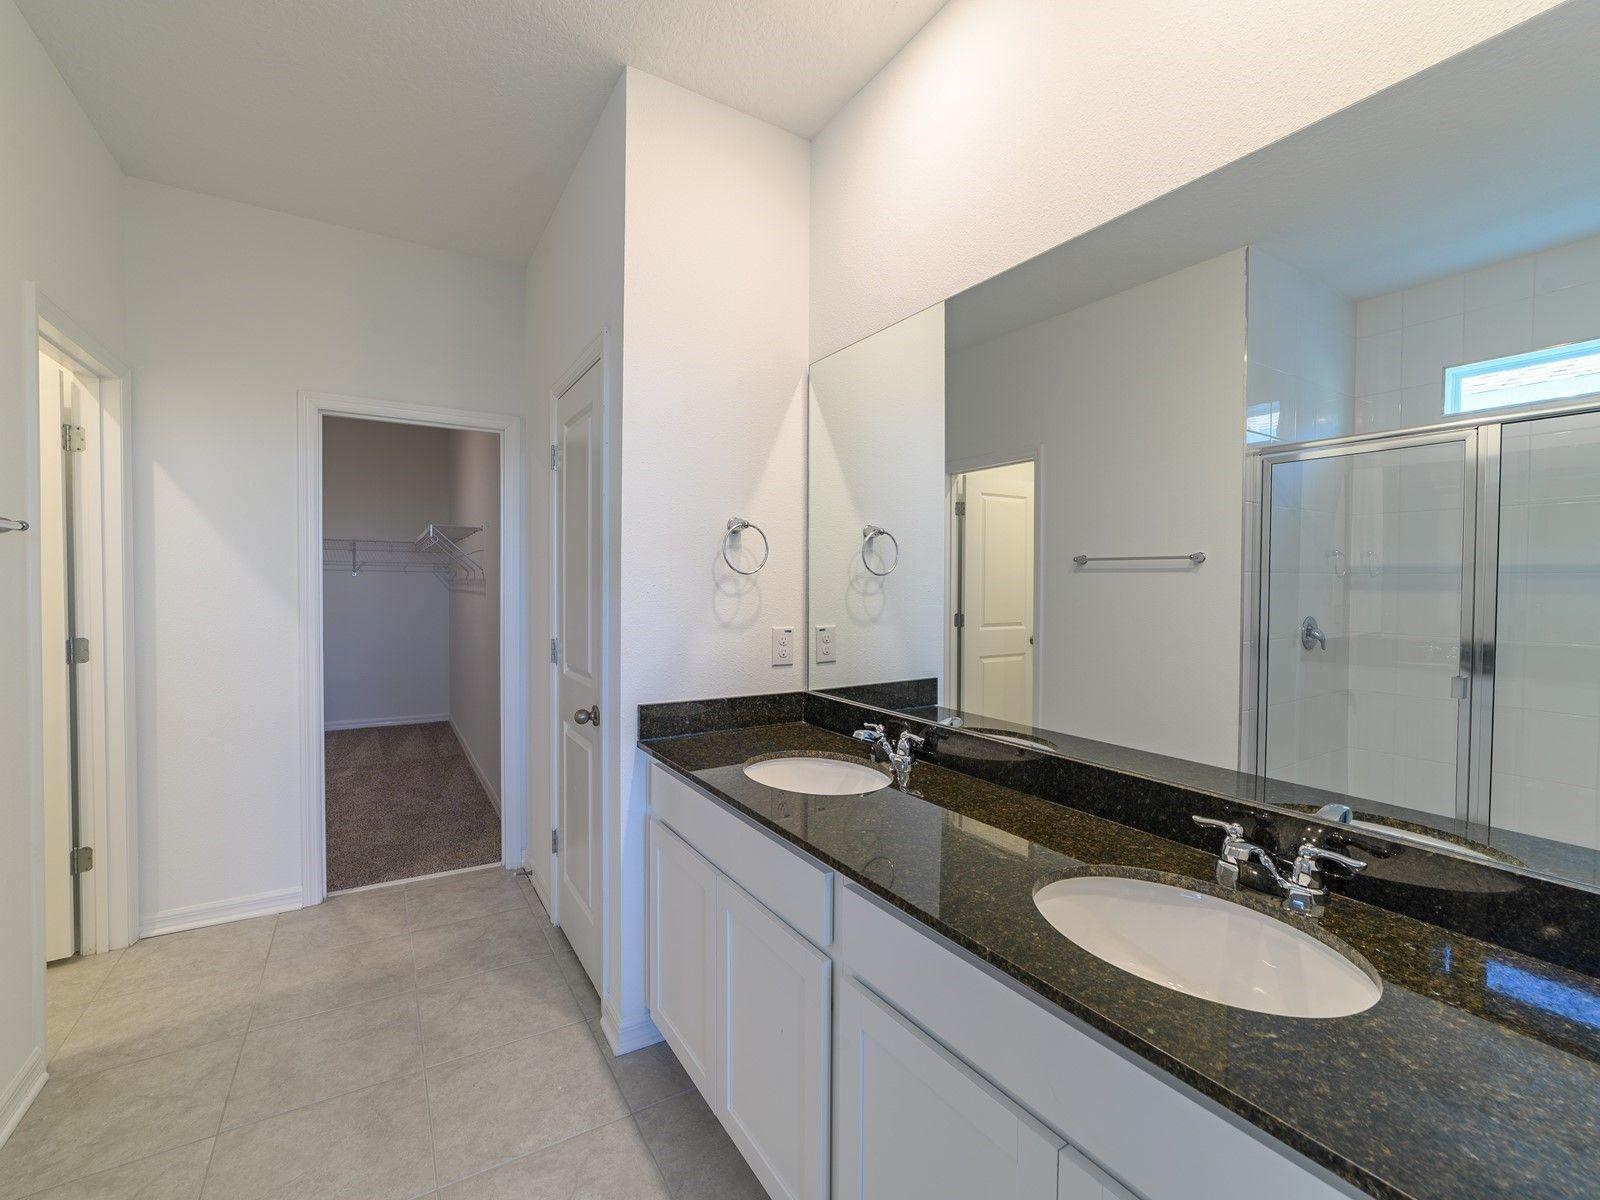 Bathroom featured in the Sunstar By Meritage Homes in Sarasota-Bradenton, FL